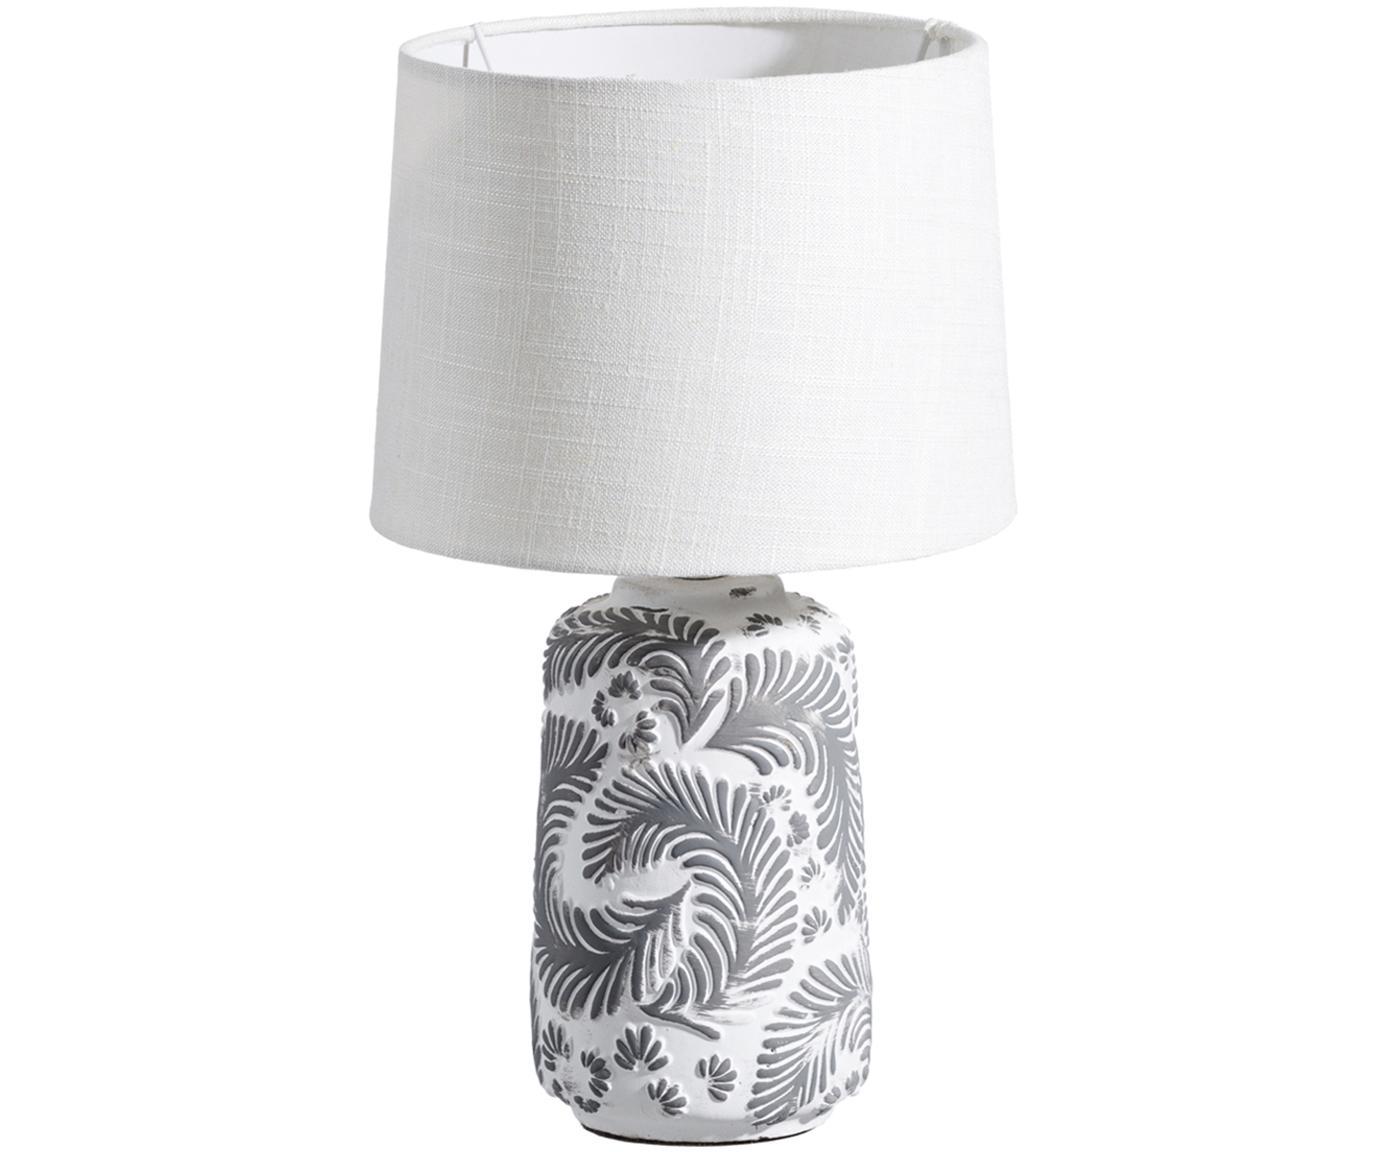 Lampada da tavolo Folk, Ceramica, Bianco, grigio, Ø 23 x Alt. 38 cm